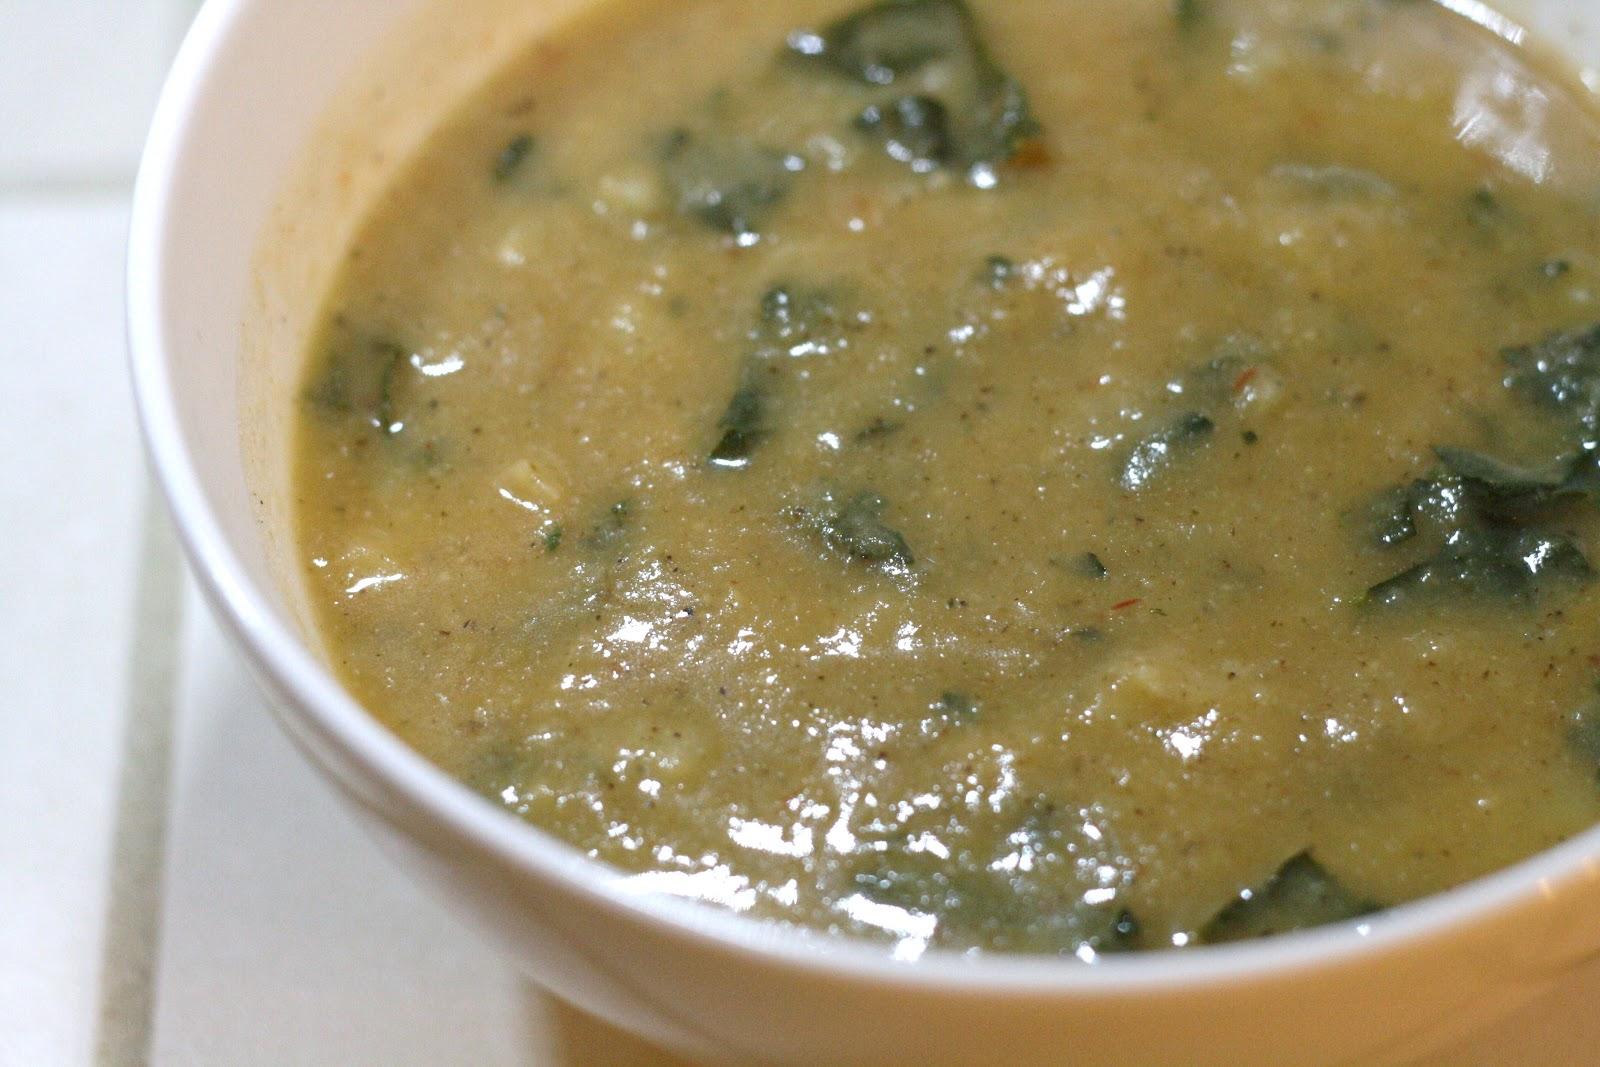 ... Recipe Box: Smoky Charred Cauliflower and Potato Soup with Kale